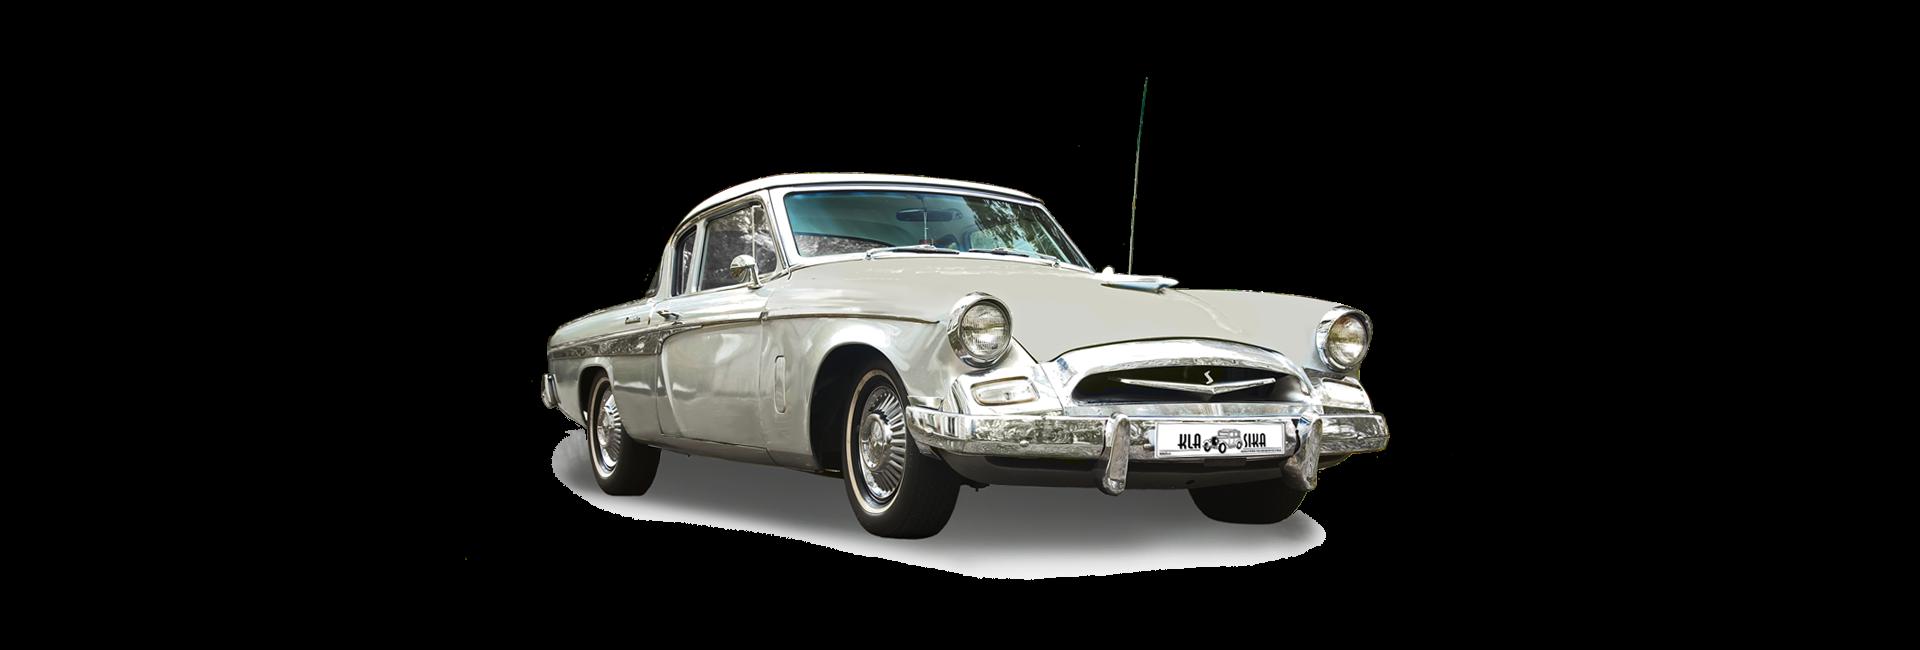 Studebaker Commander Regal Coupe, 1955 m.